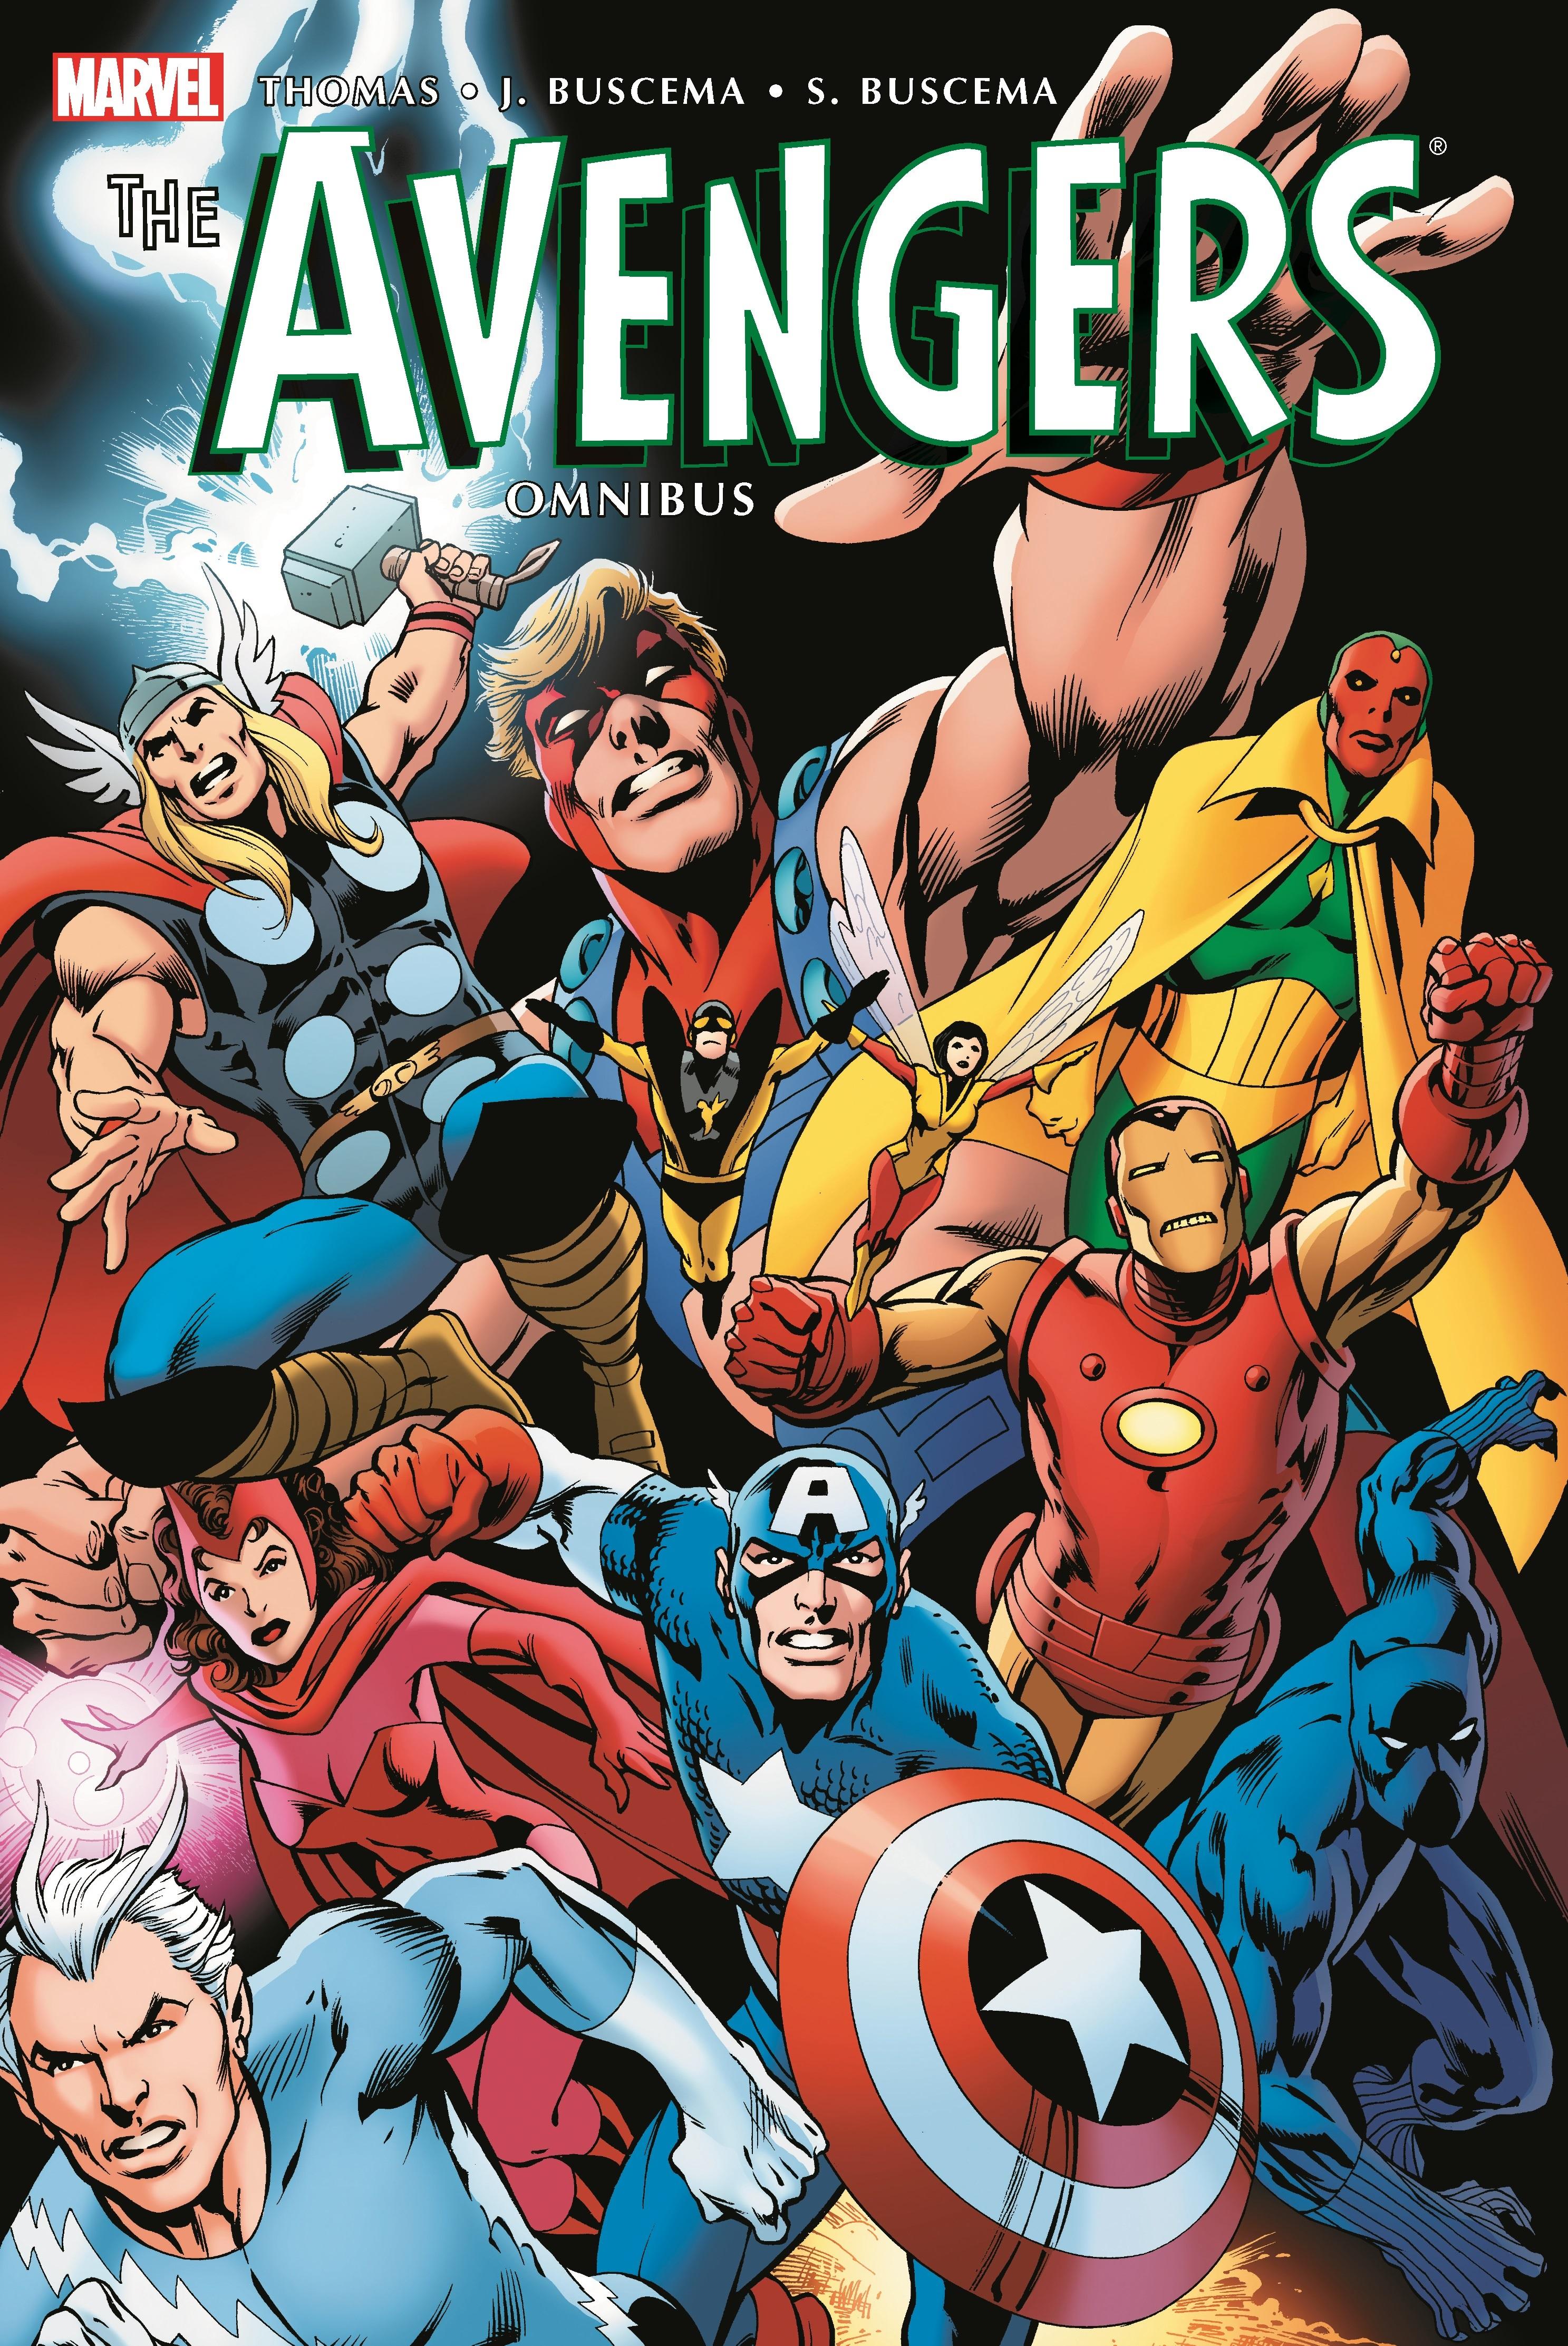 The Avengers Omnibus Vol. 3 (Hardcover)